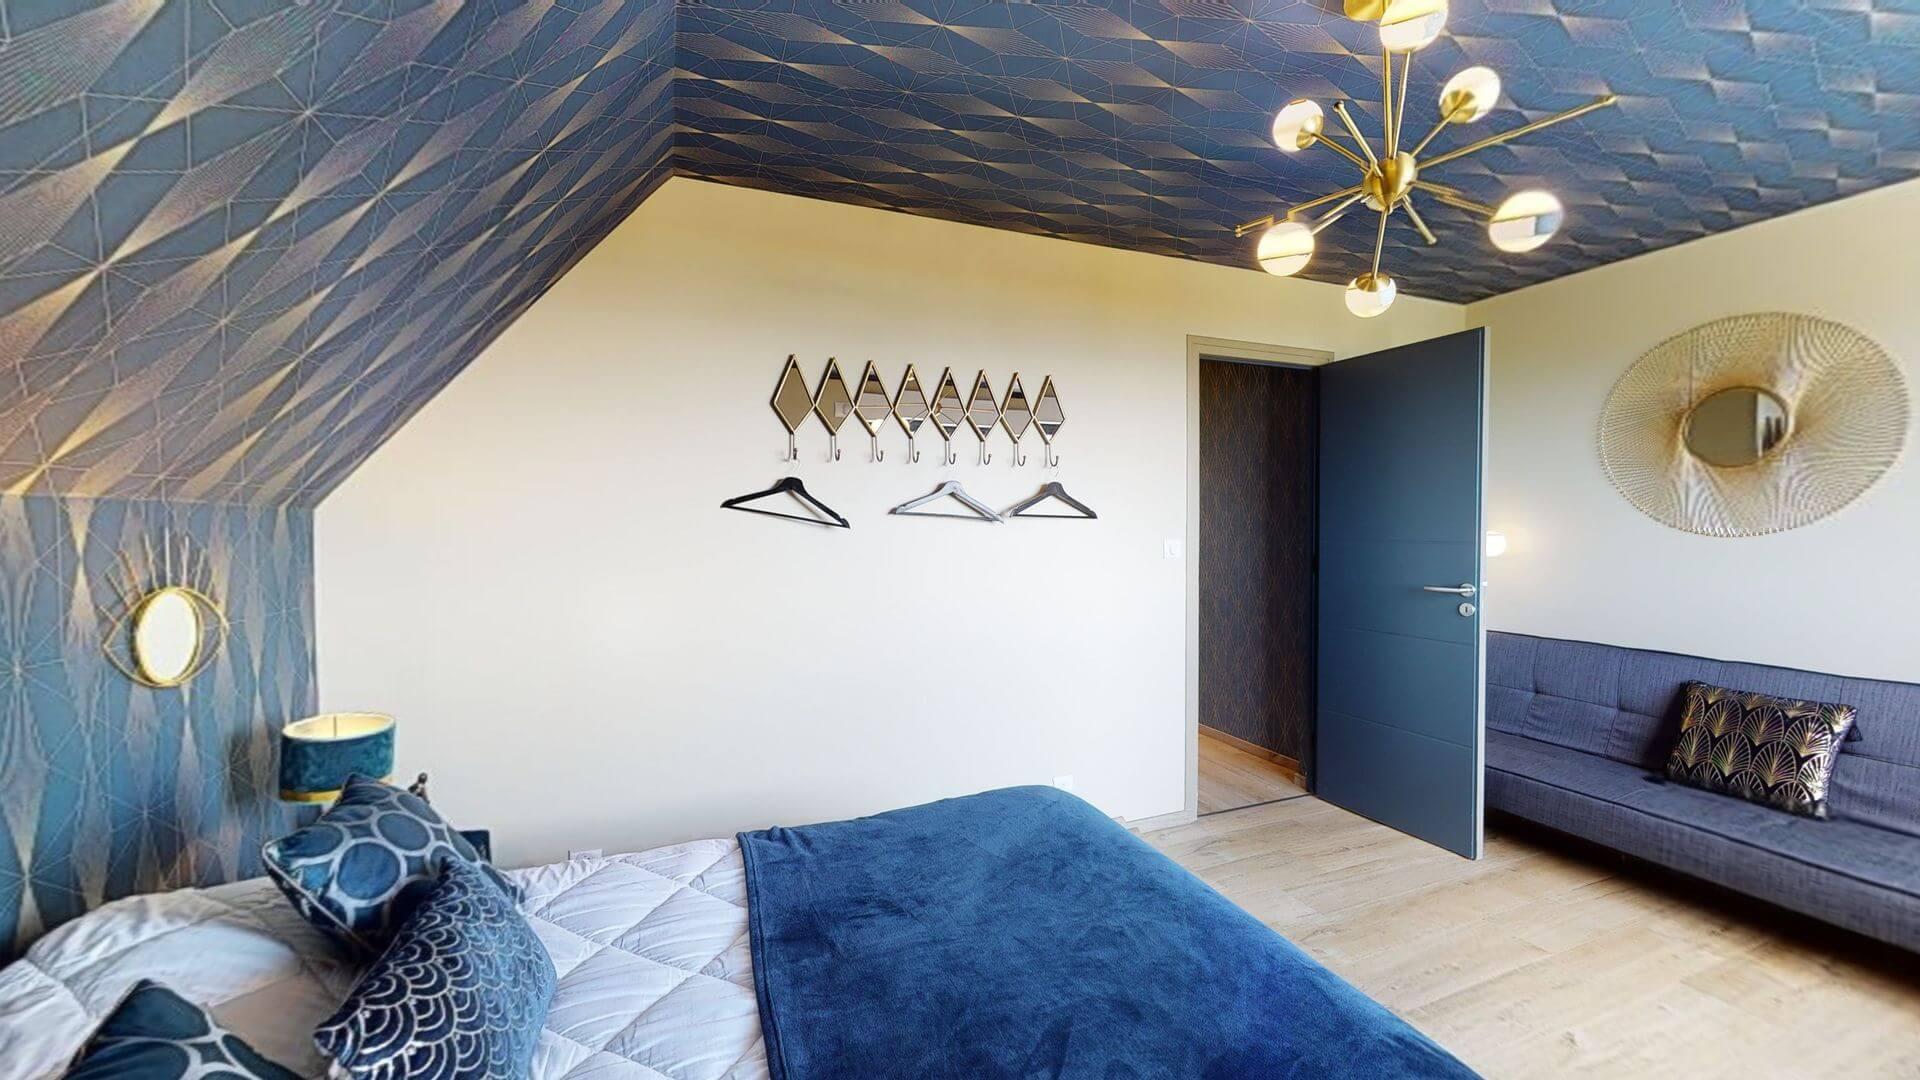 5 CHAMBRES & 2 SDB La Casa dAntoine par LA CLEF DECAMP 06032021 213721